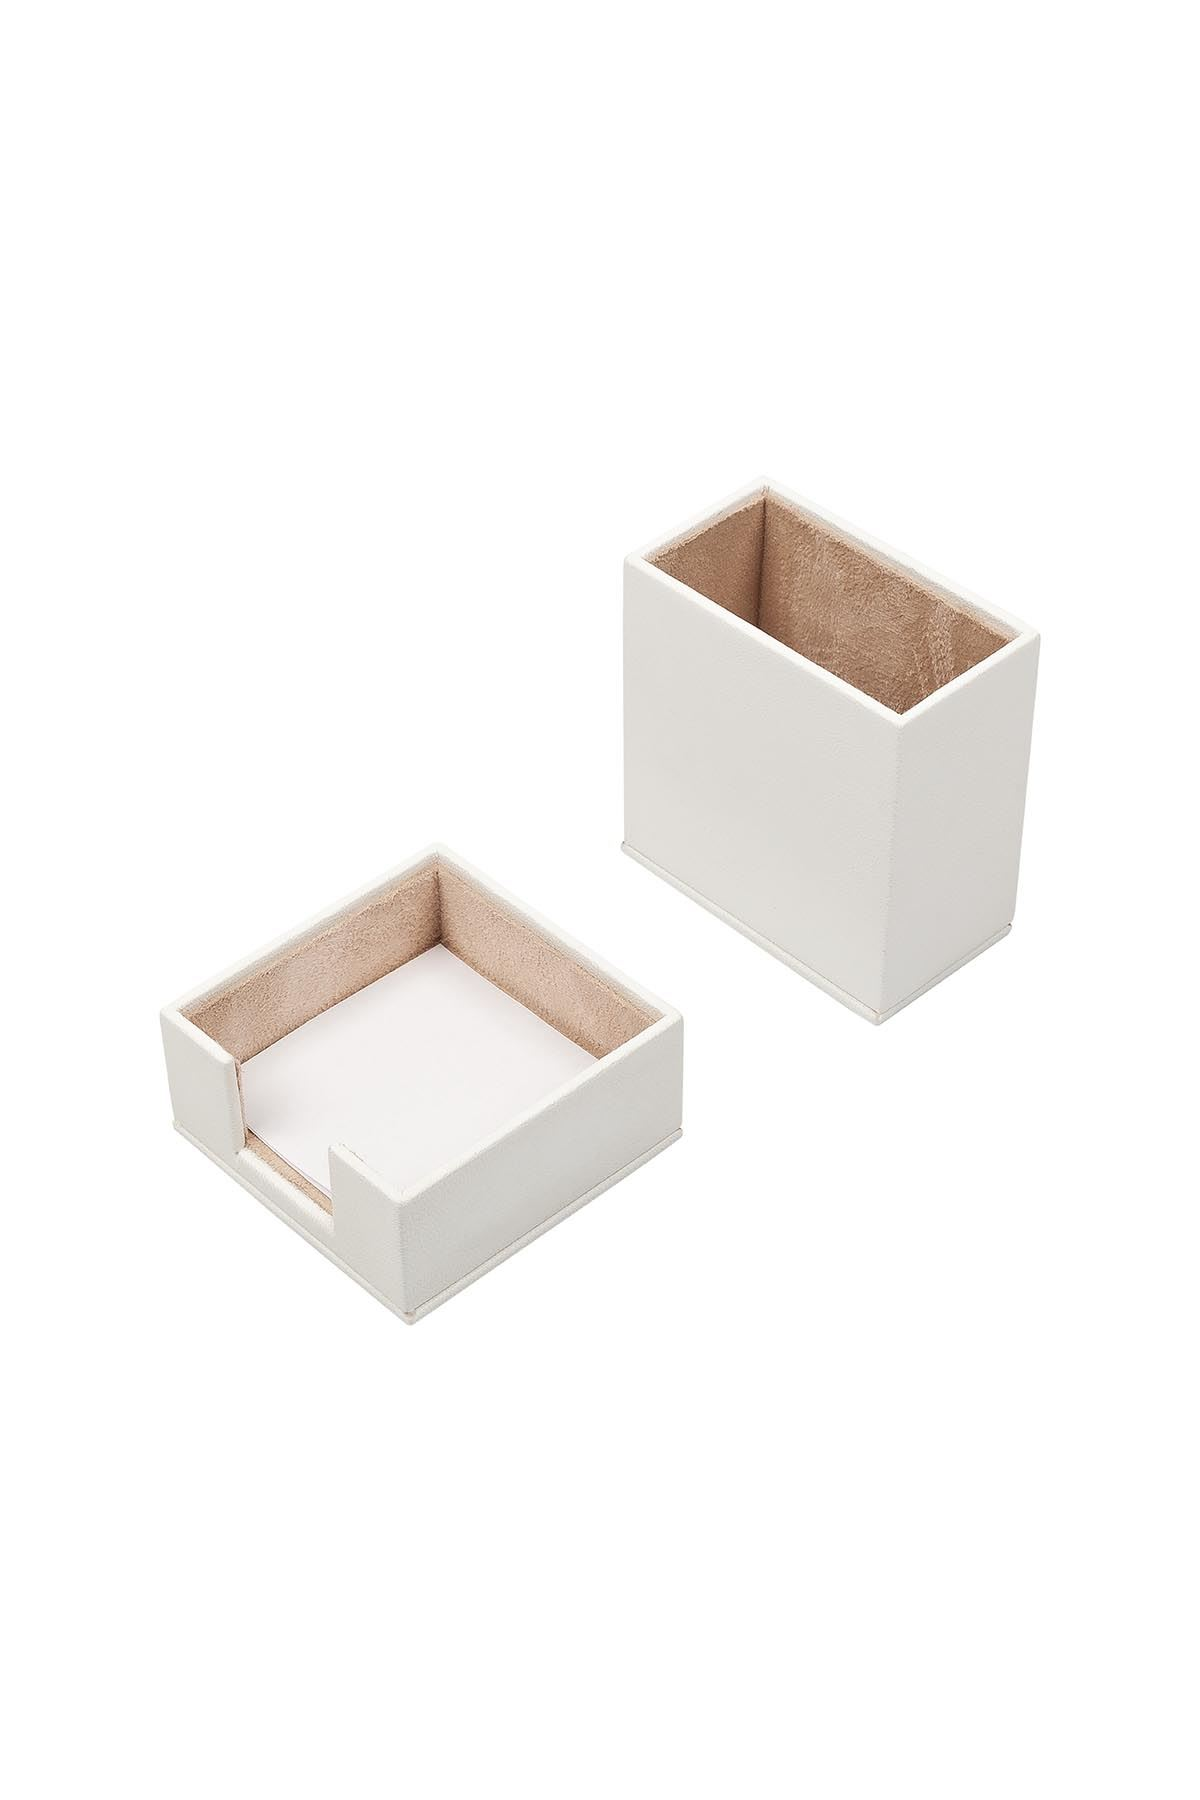 Leather Desk Accessories set of 2 White| Desk Set Accessories | Desktop Accessories | Desk Accessories | Desk Organizers | Pencil Holder | Note Paper Holder